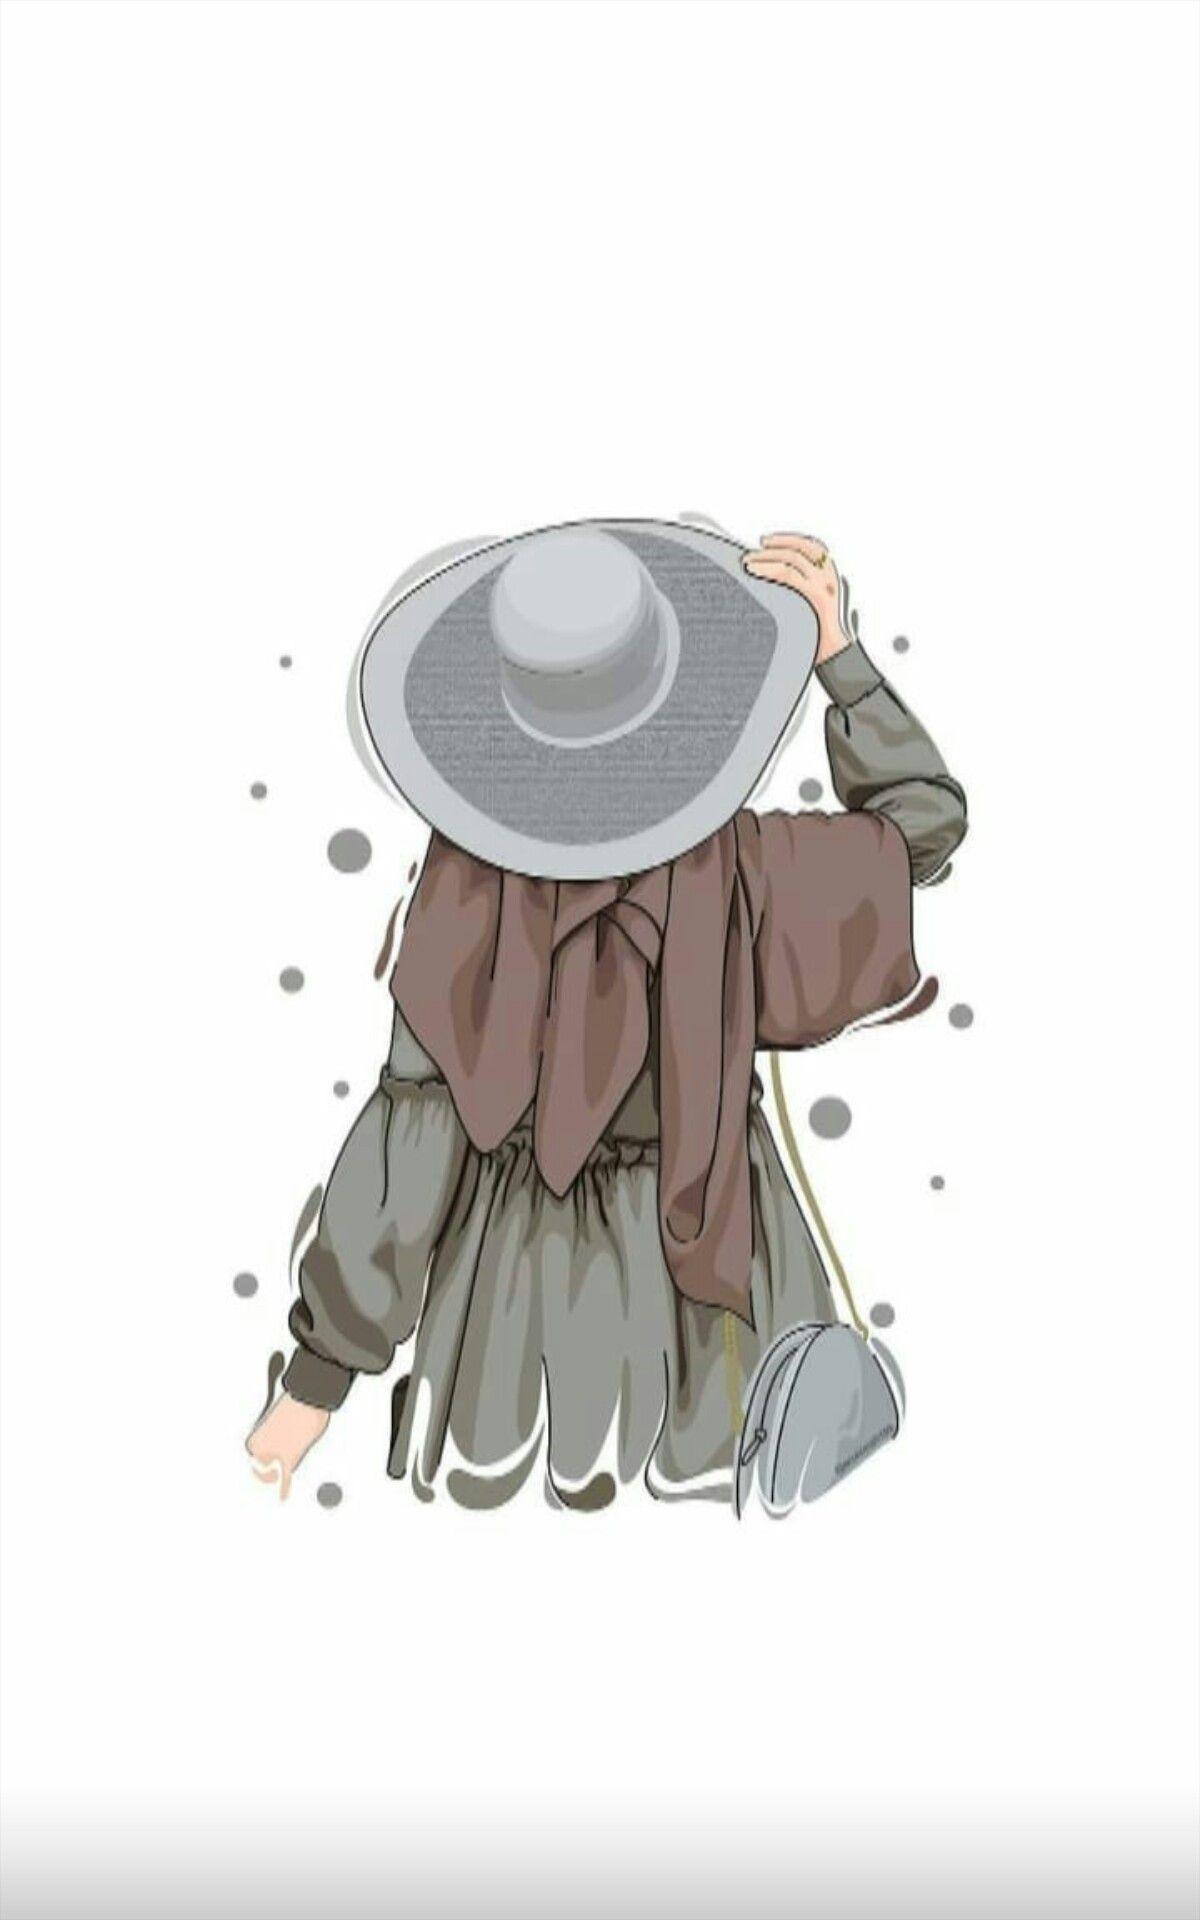 Tesetturlu Kiz Resmi Di 2020 Ilustrasi Karakter Animasi Seni Animasi